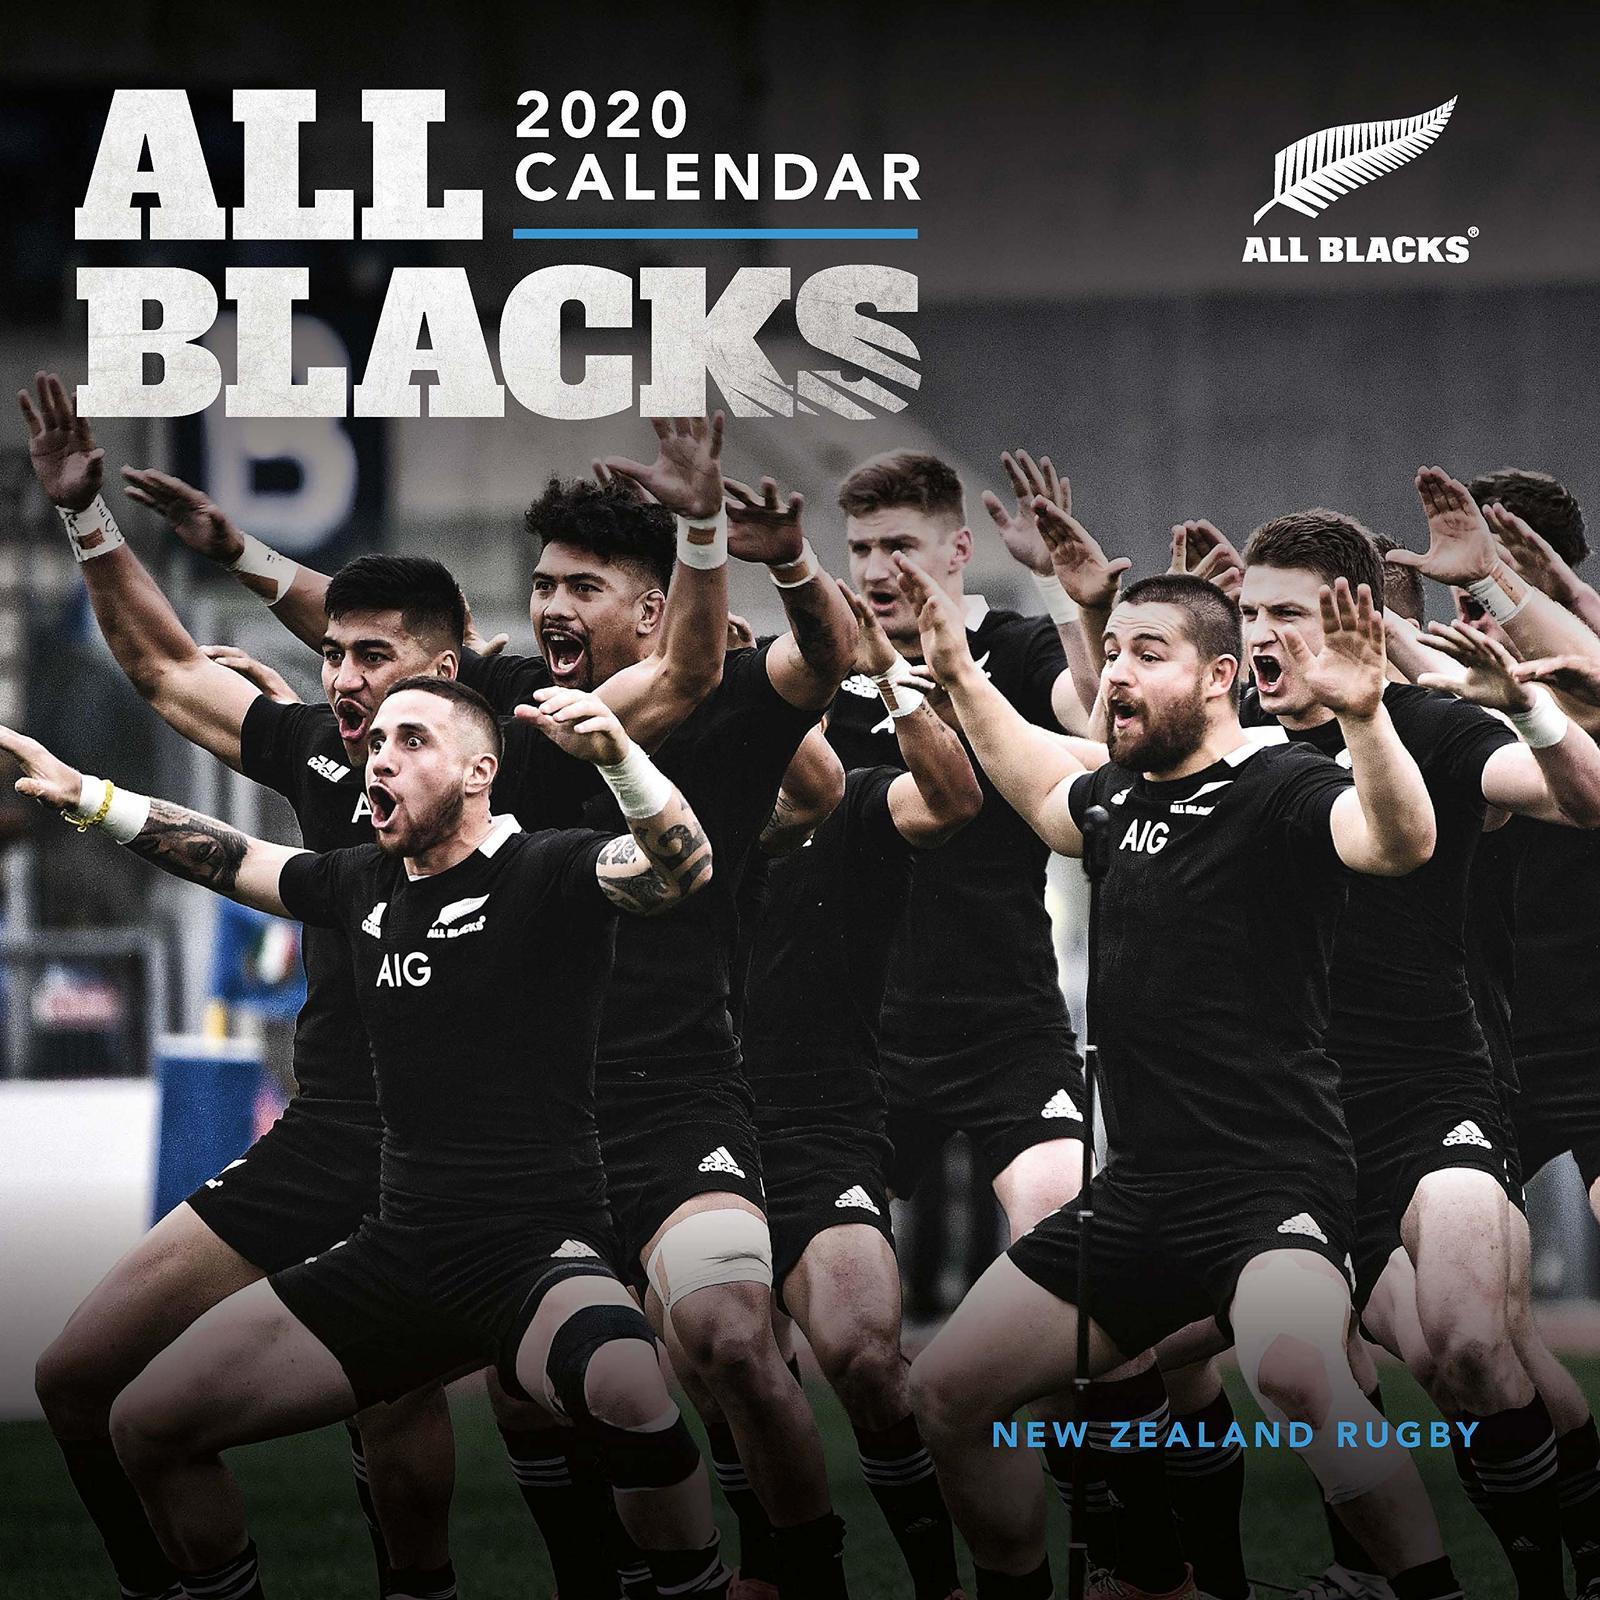 All Blacks 2020 Square Wall Calendar image